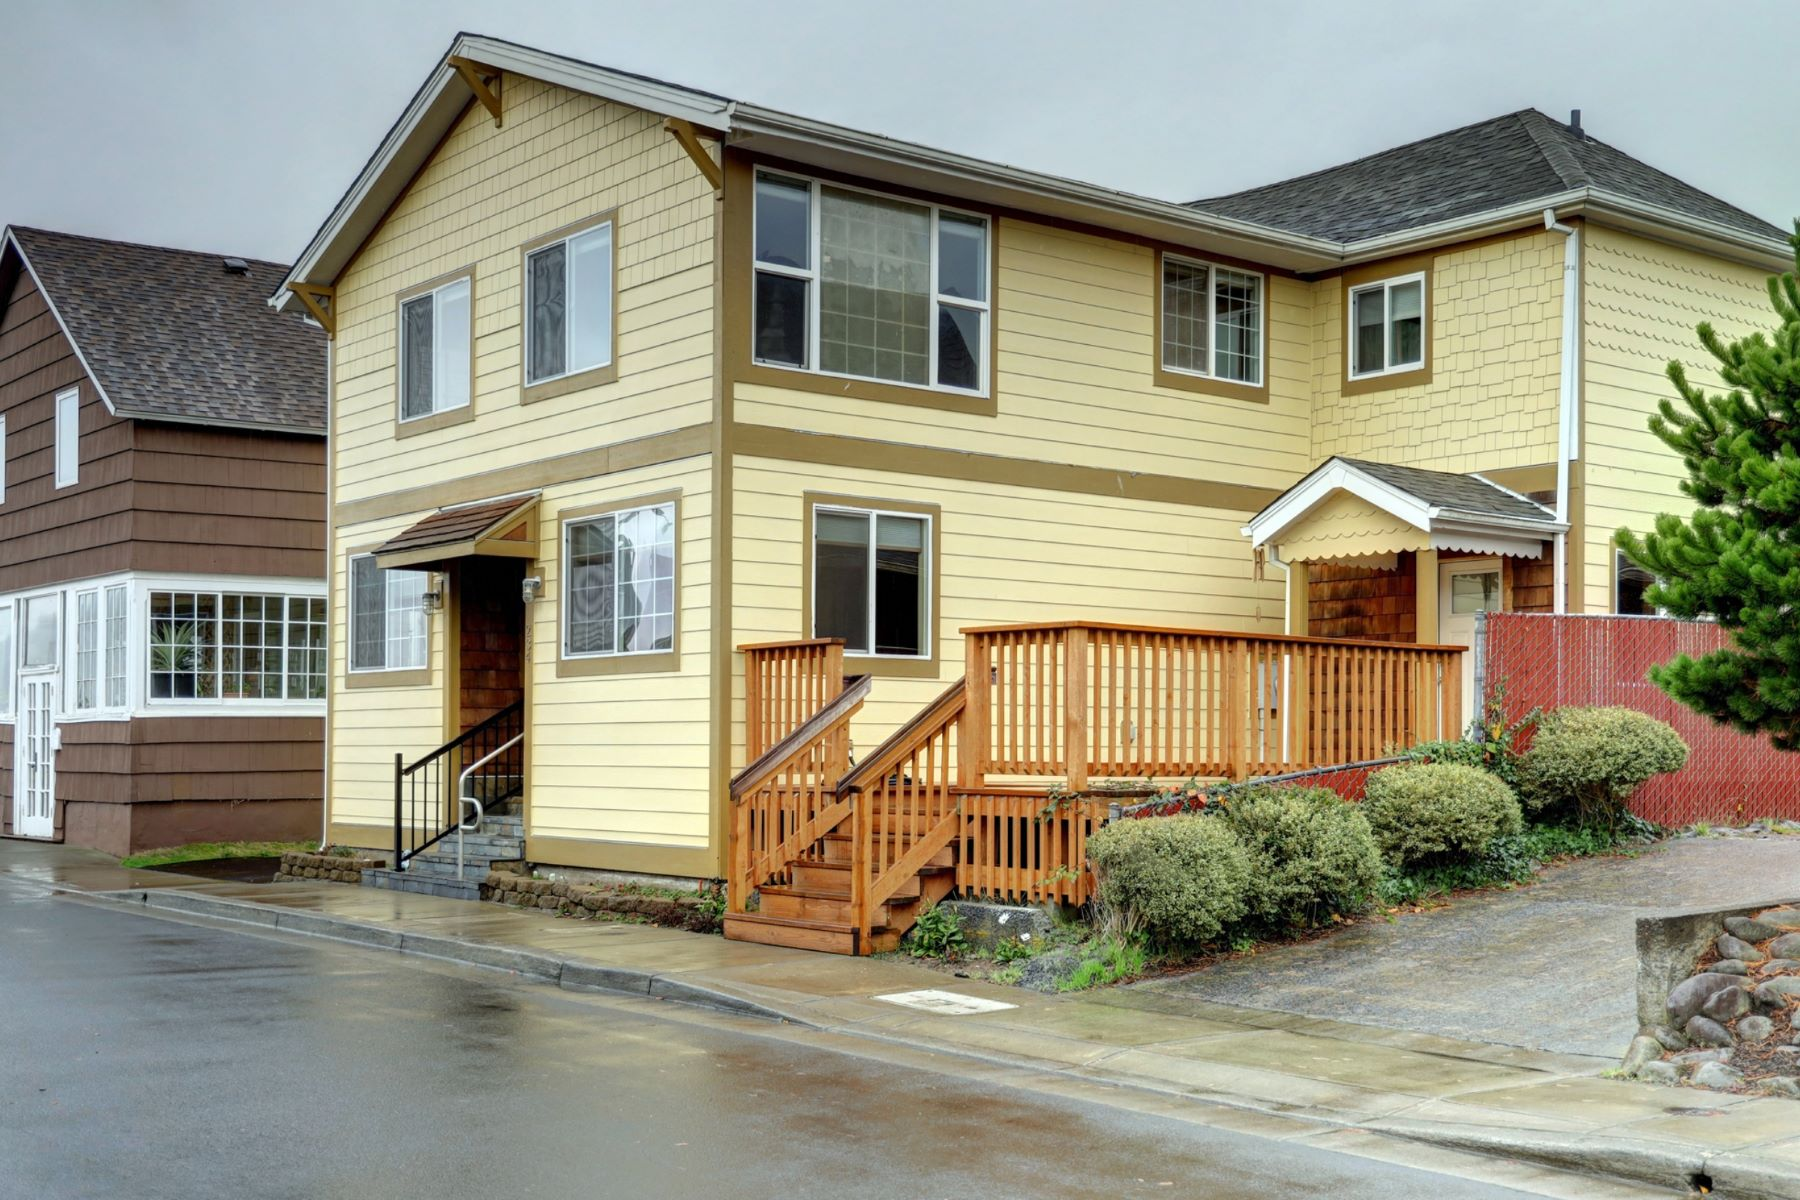 Other Residential Homes για την Πώληση στο 234 12th Ave Seaside, OR 97138 Seaside, Ορεγκον 97138 Ηνωμένες Πολιτείες